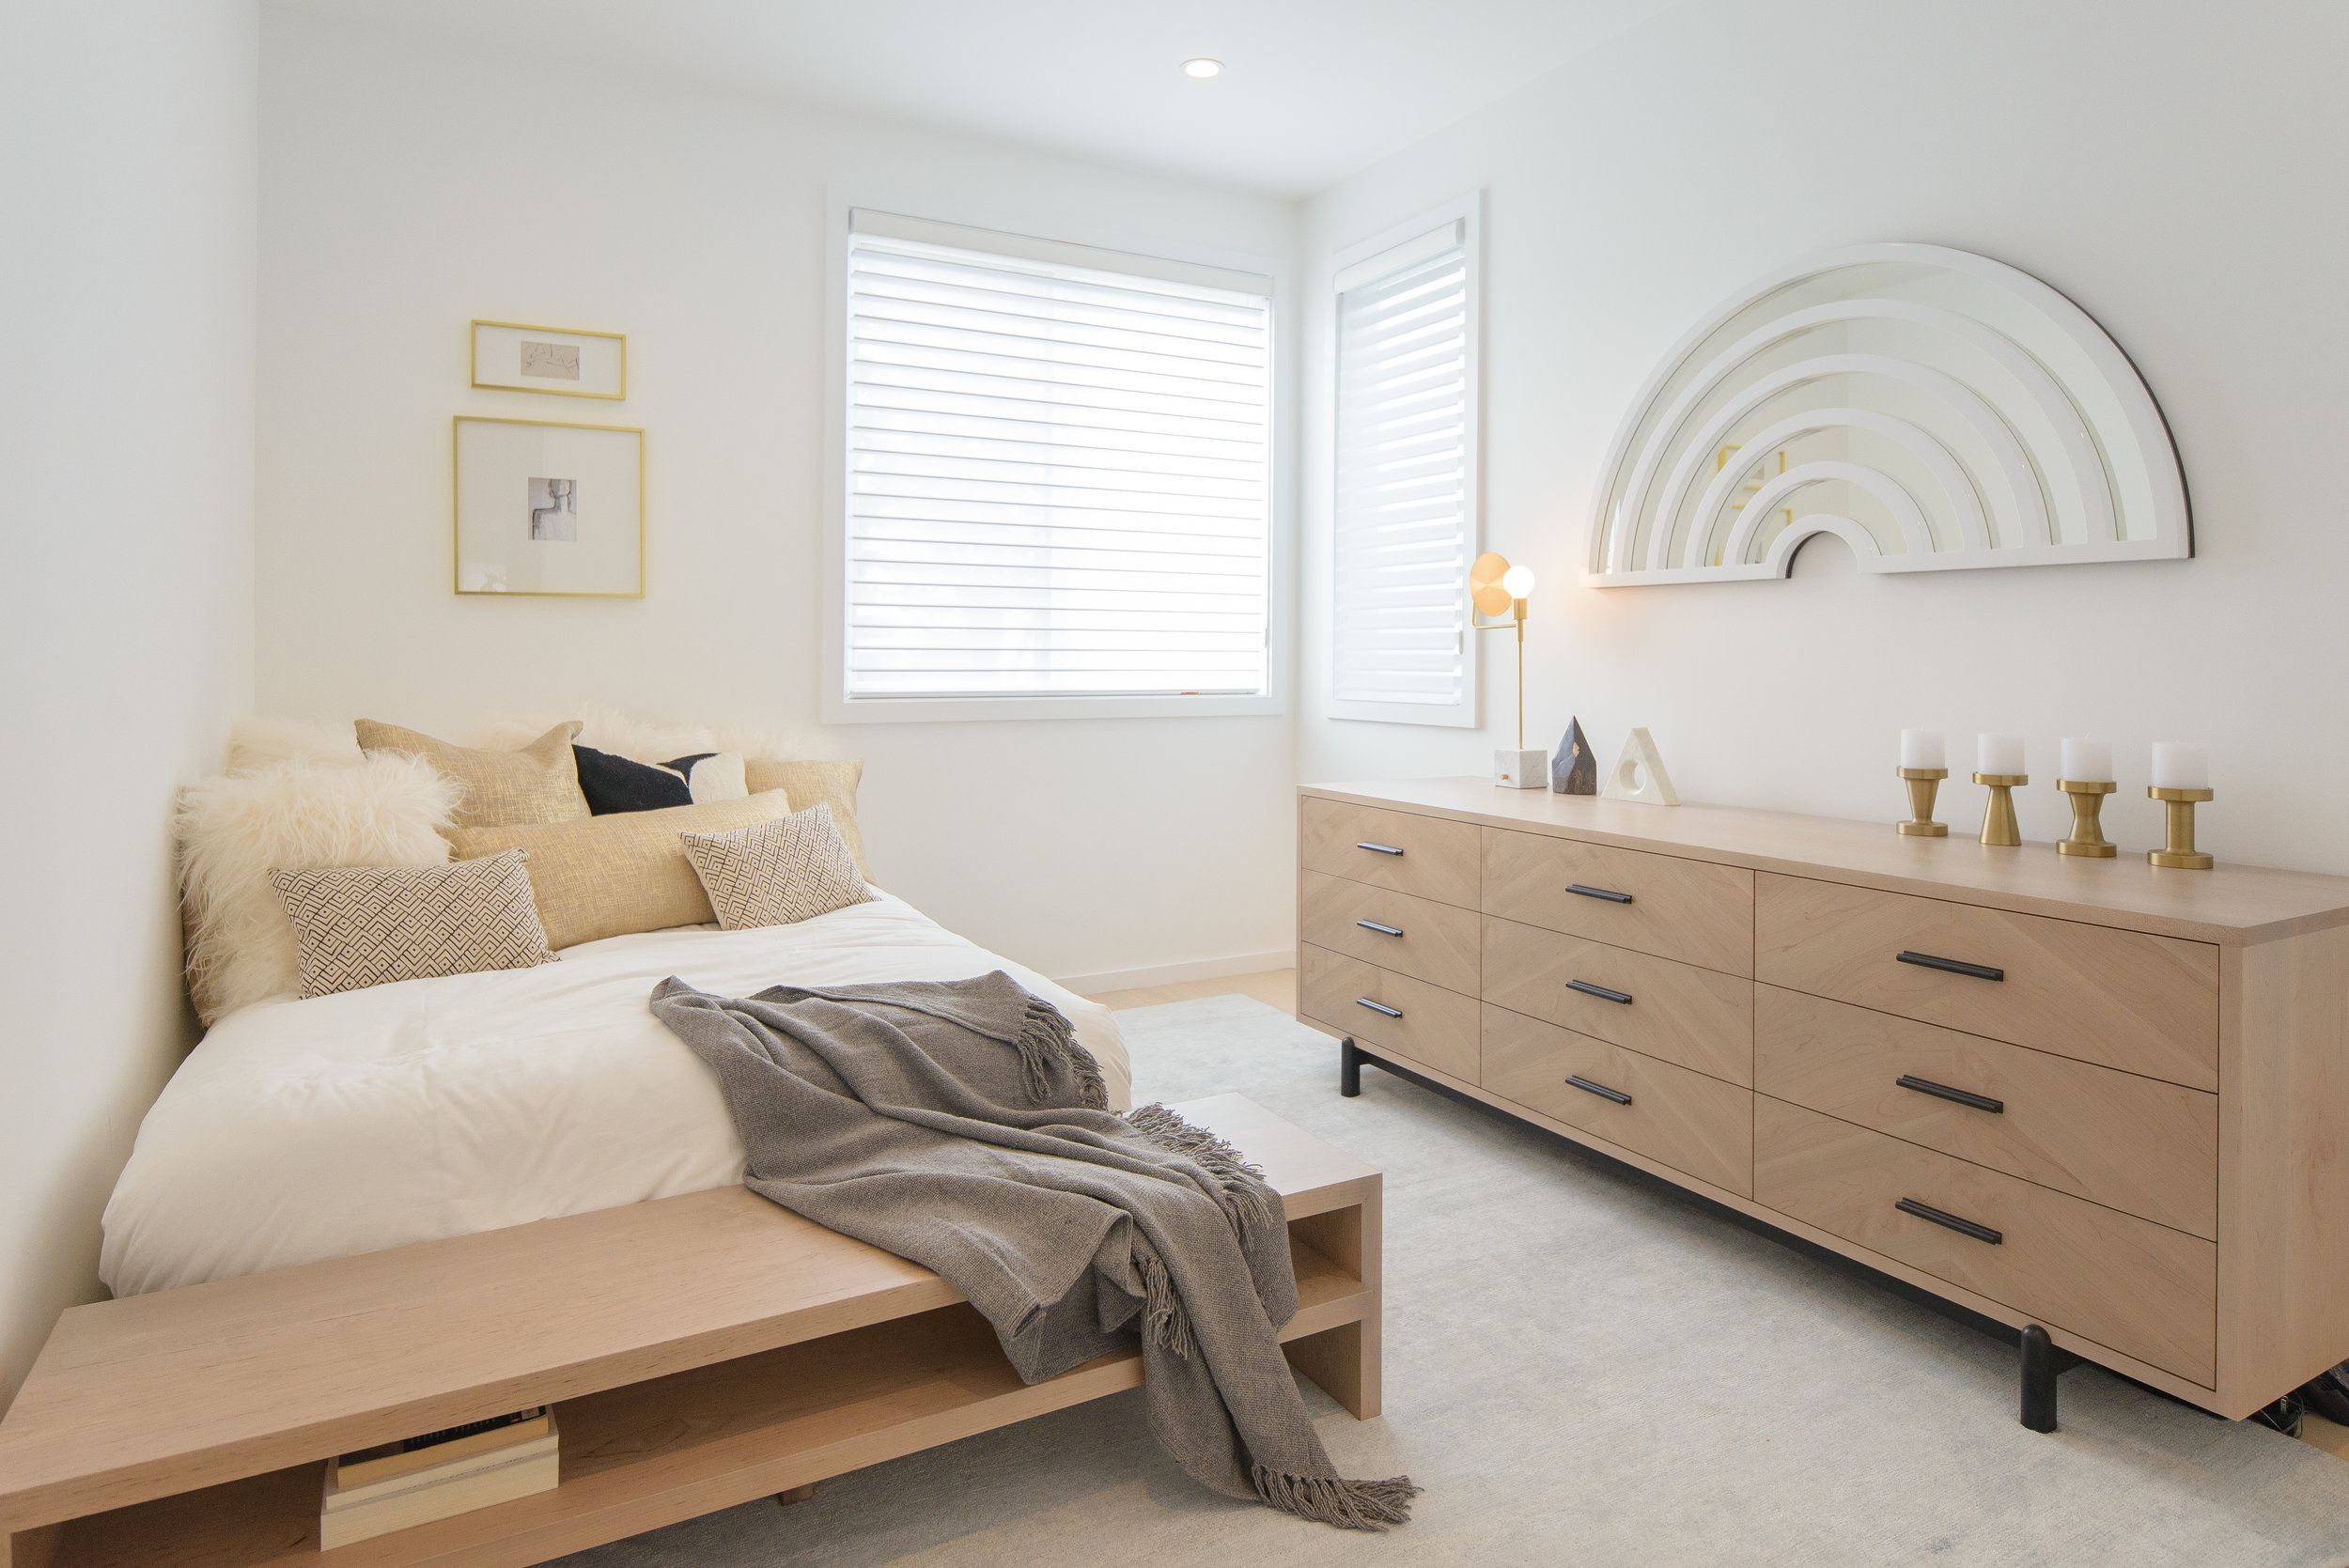 cozy Scandinavian bedroom ideas that will inspire you to remodel